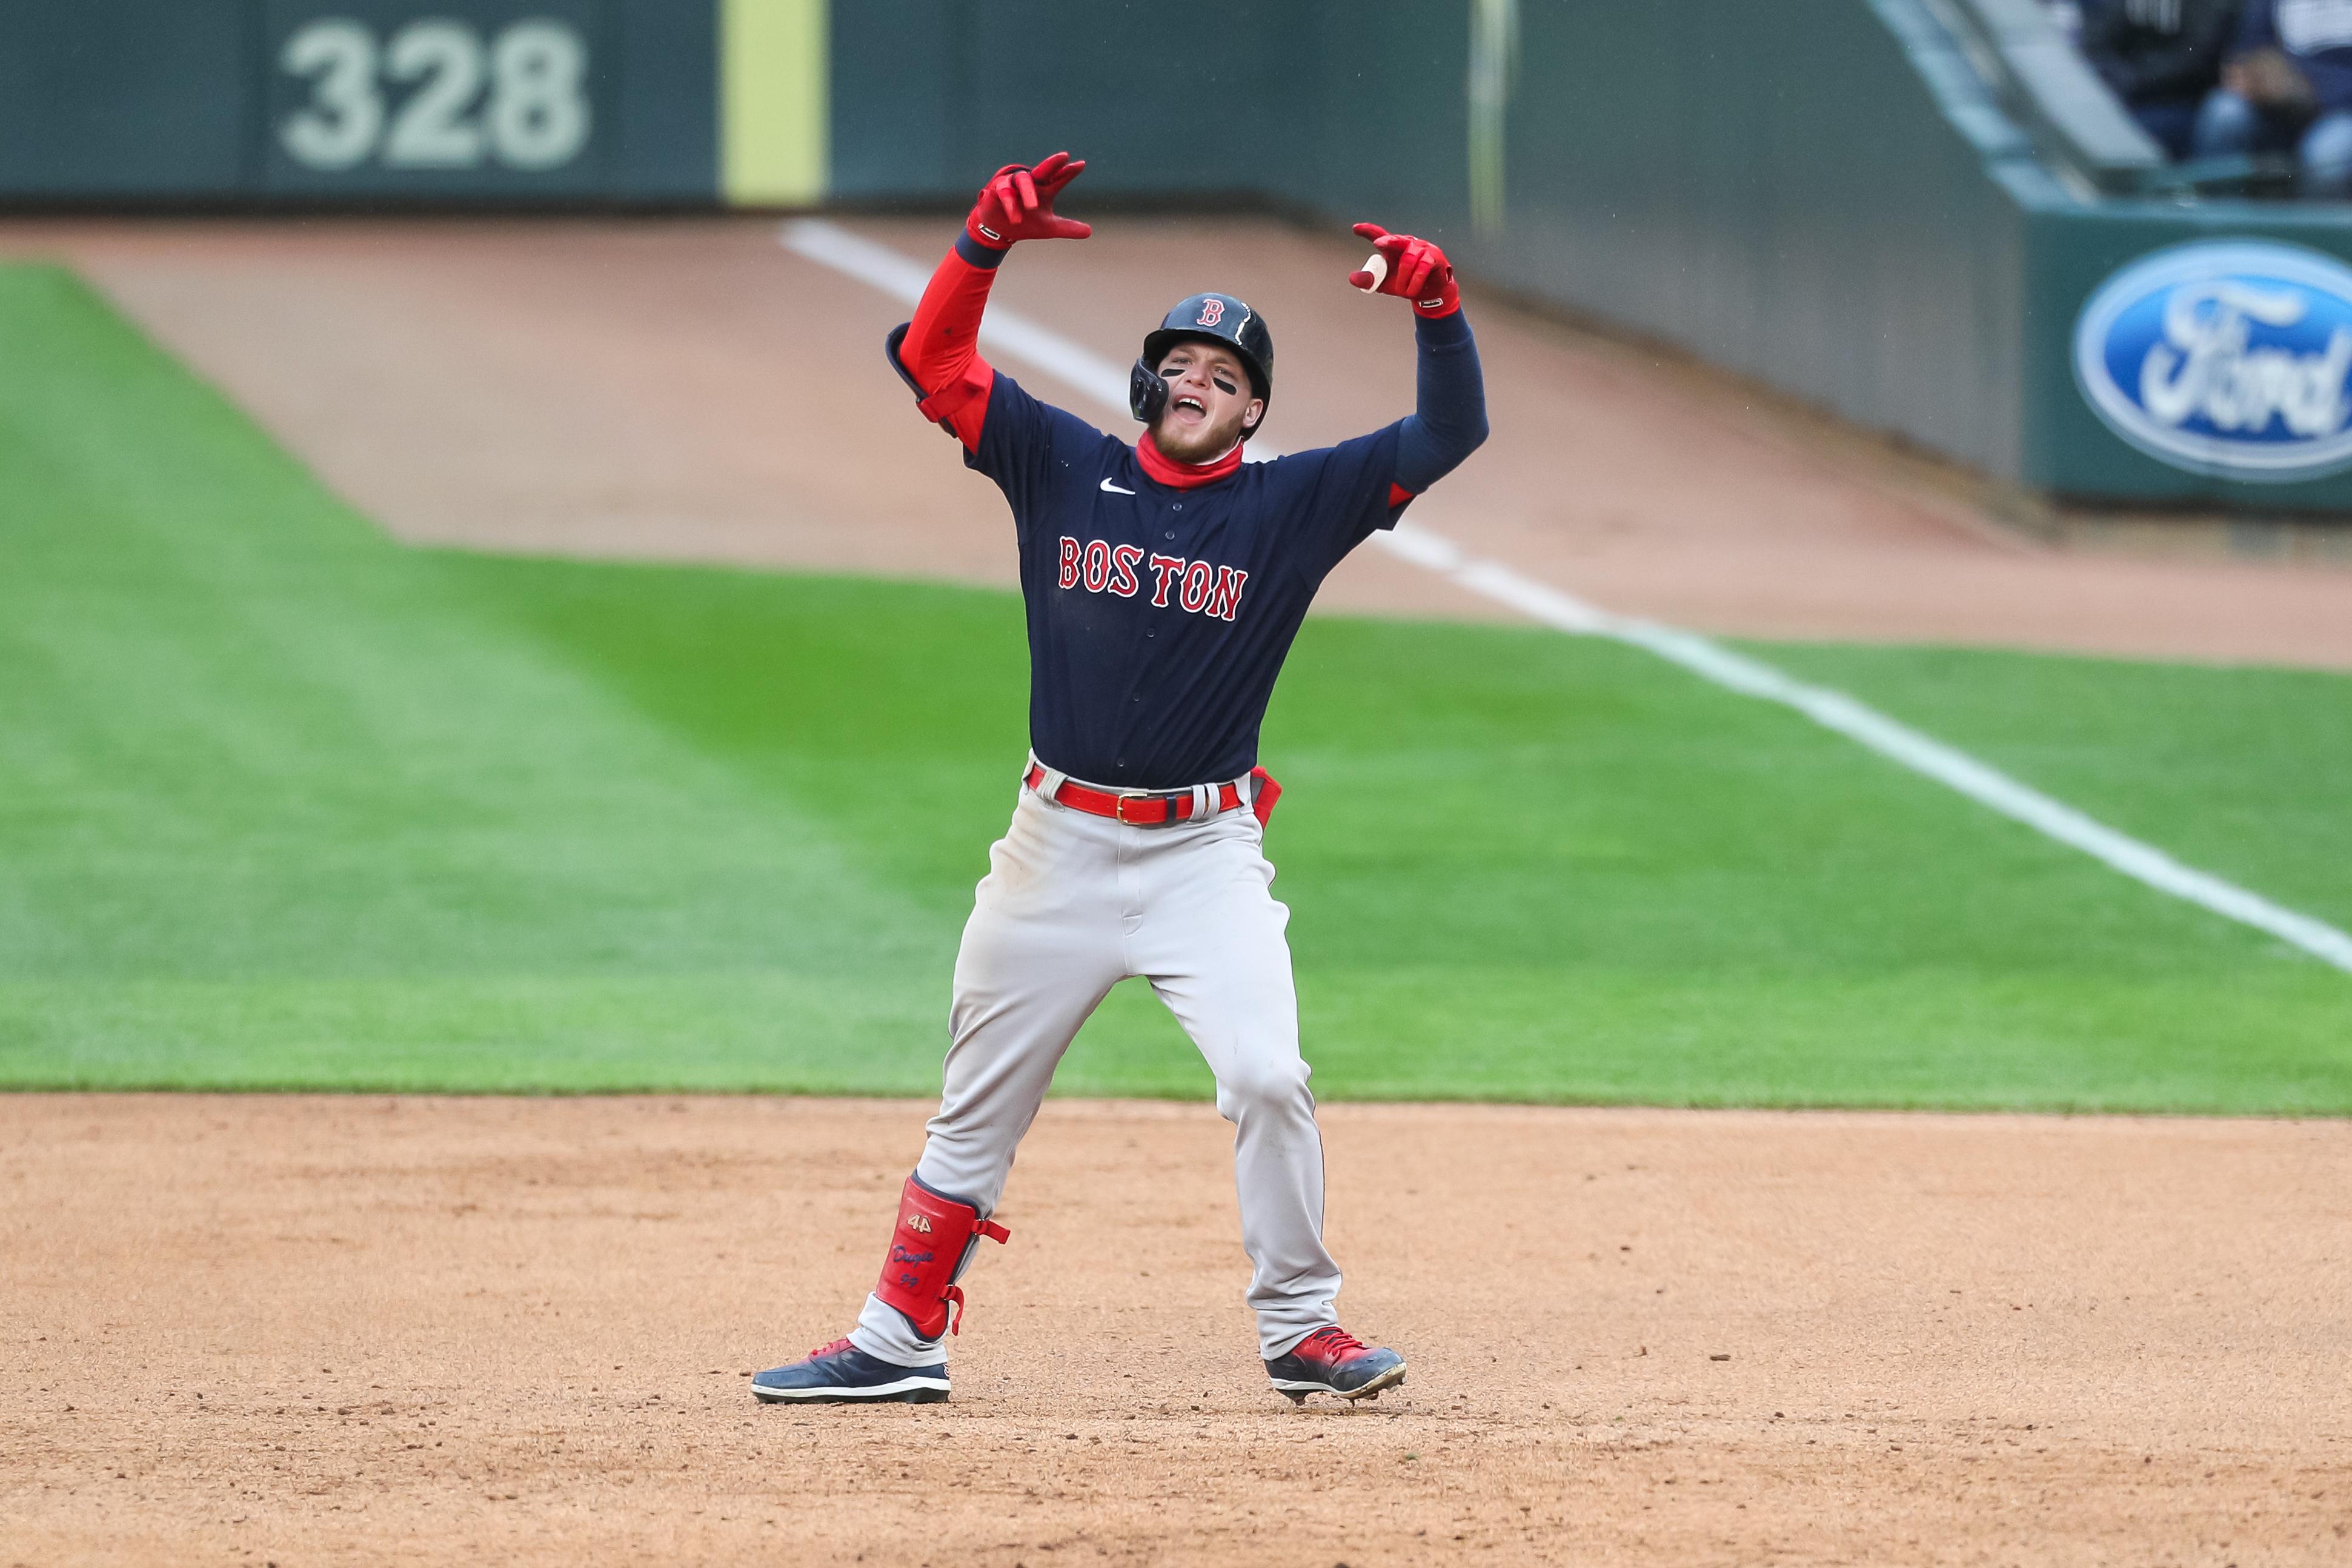 Boston Red Sox v Minnesota Twins Game 2